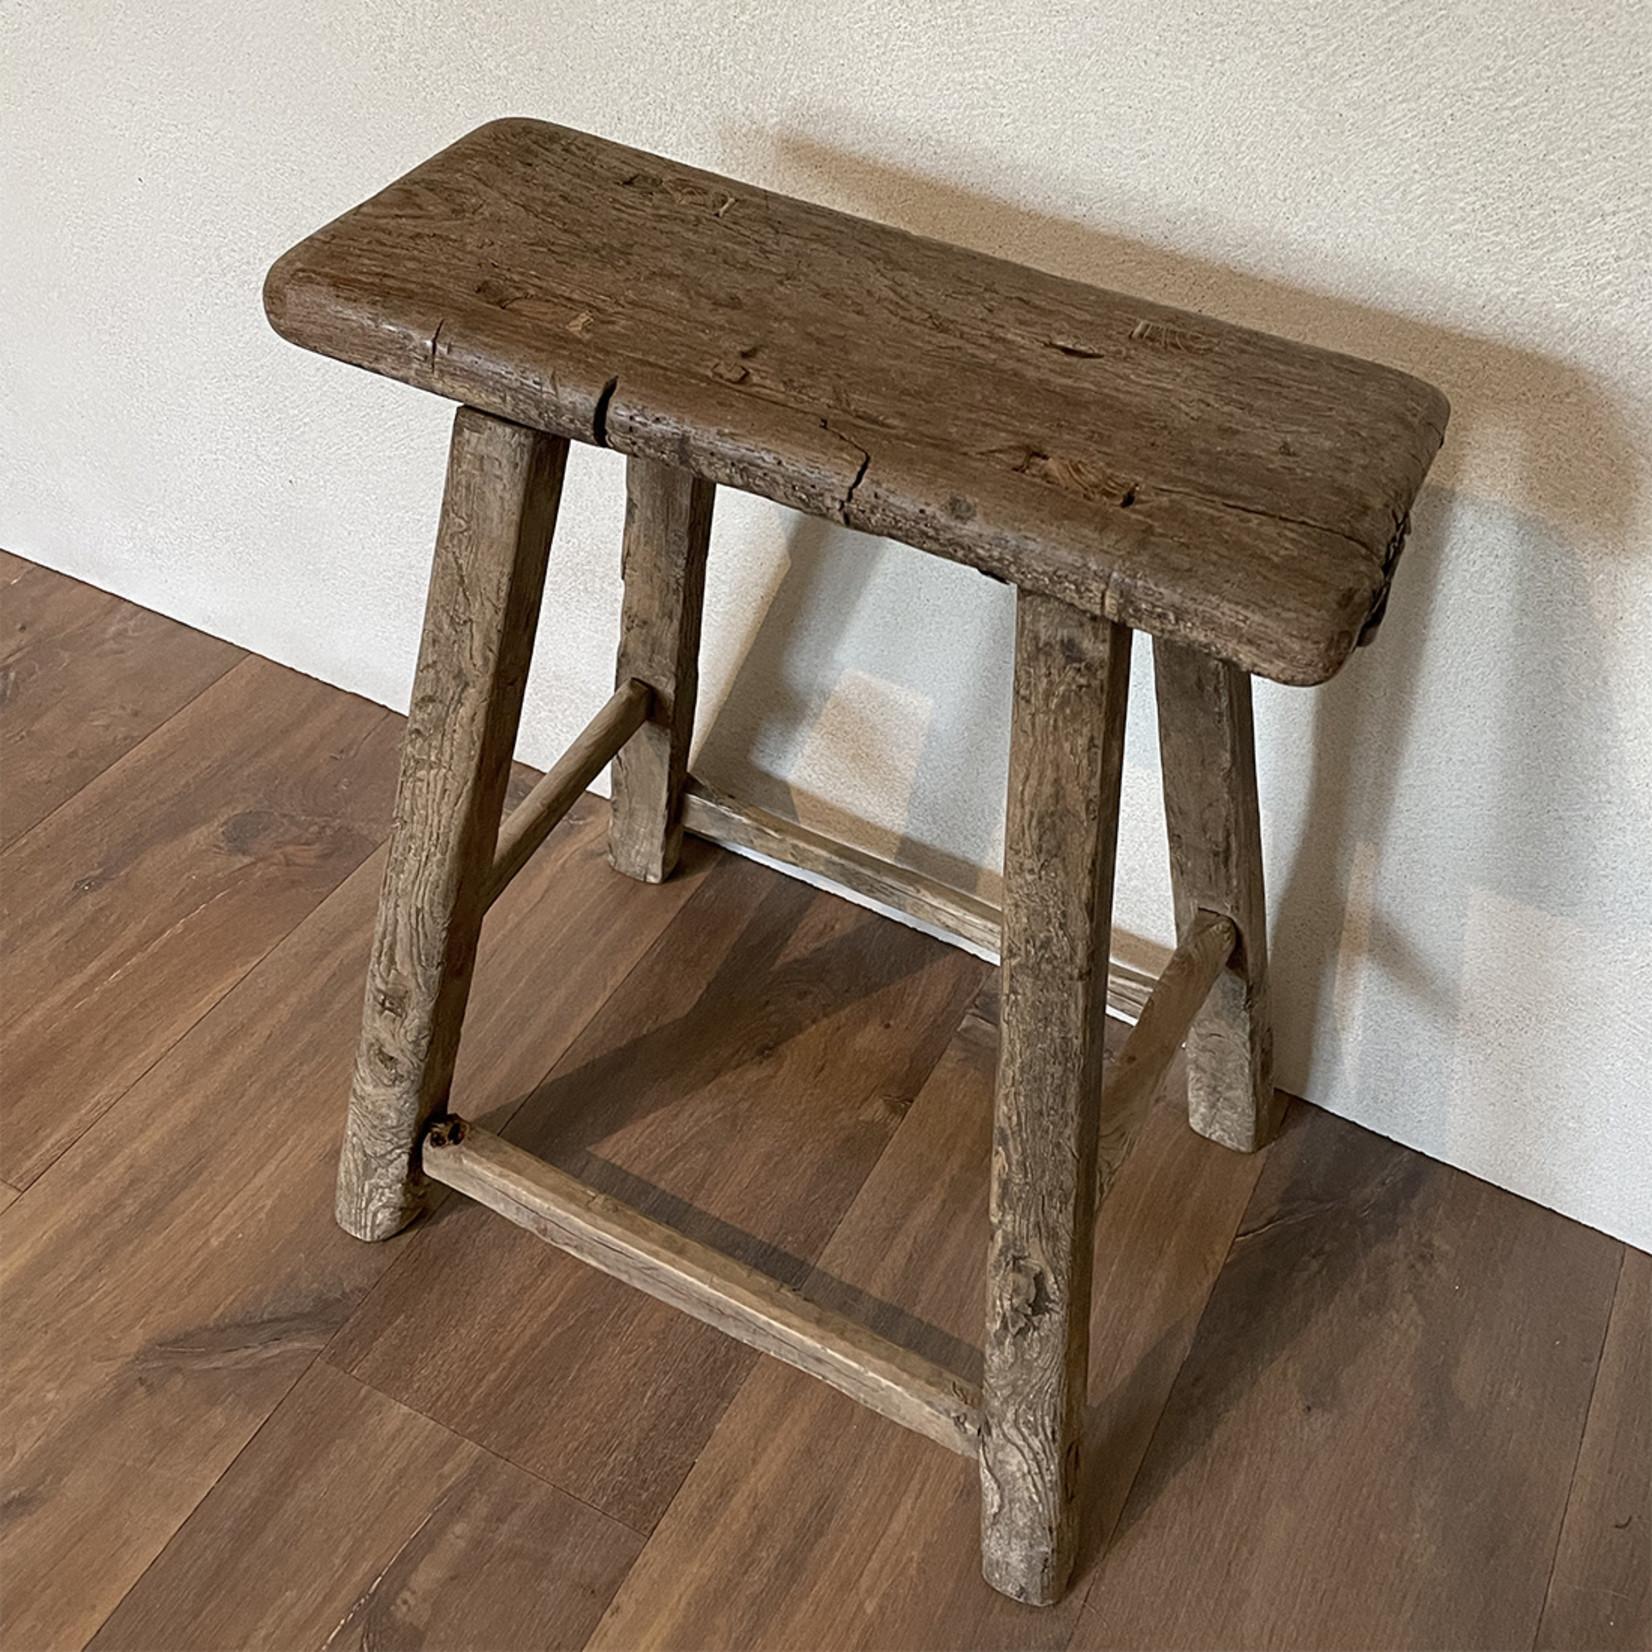 Olm stool °5